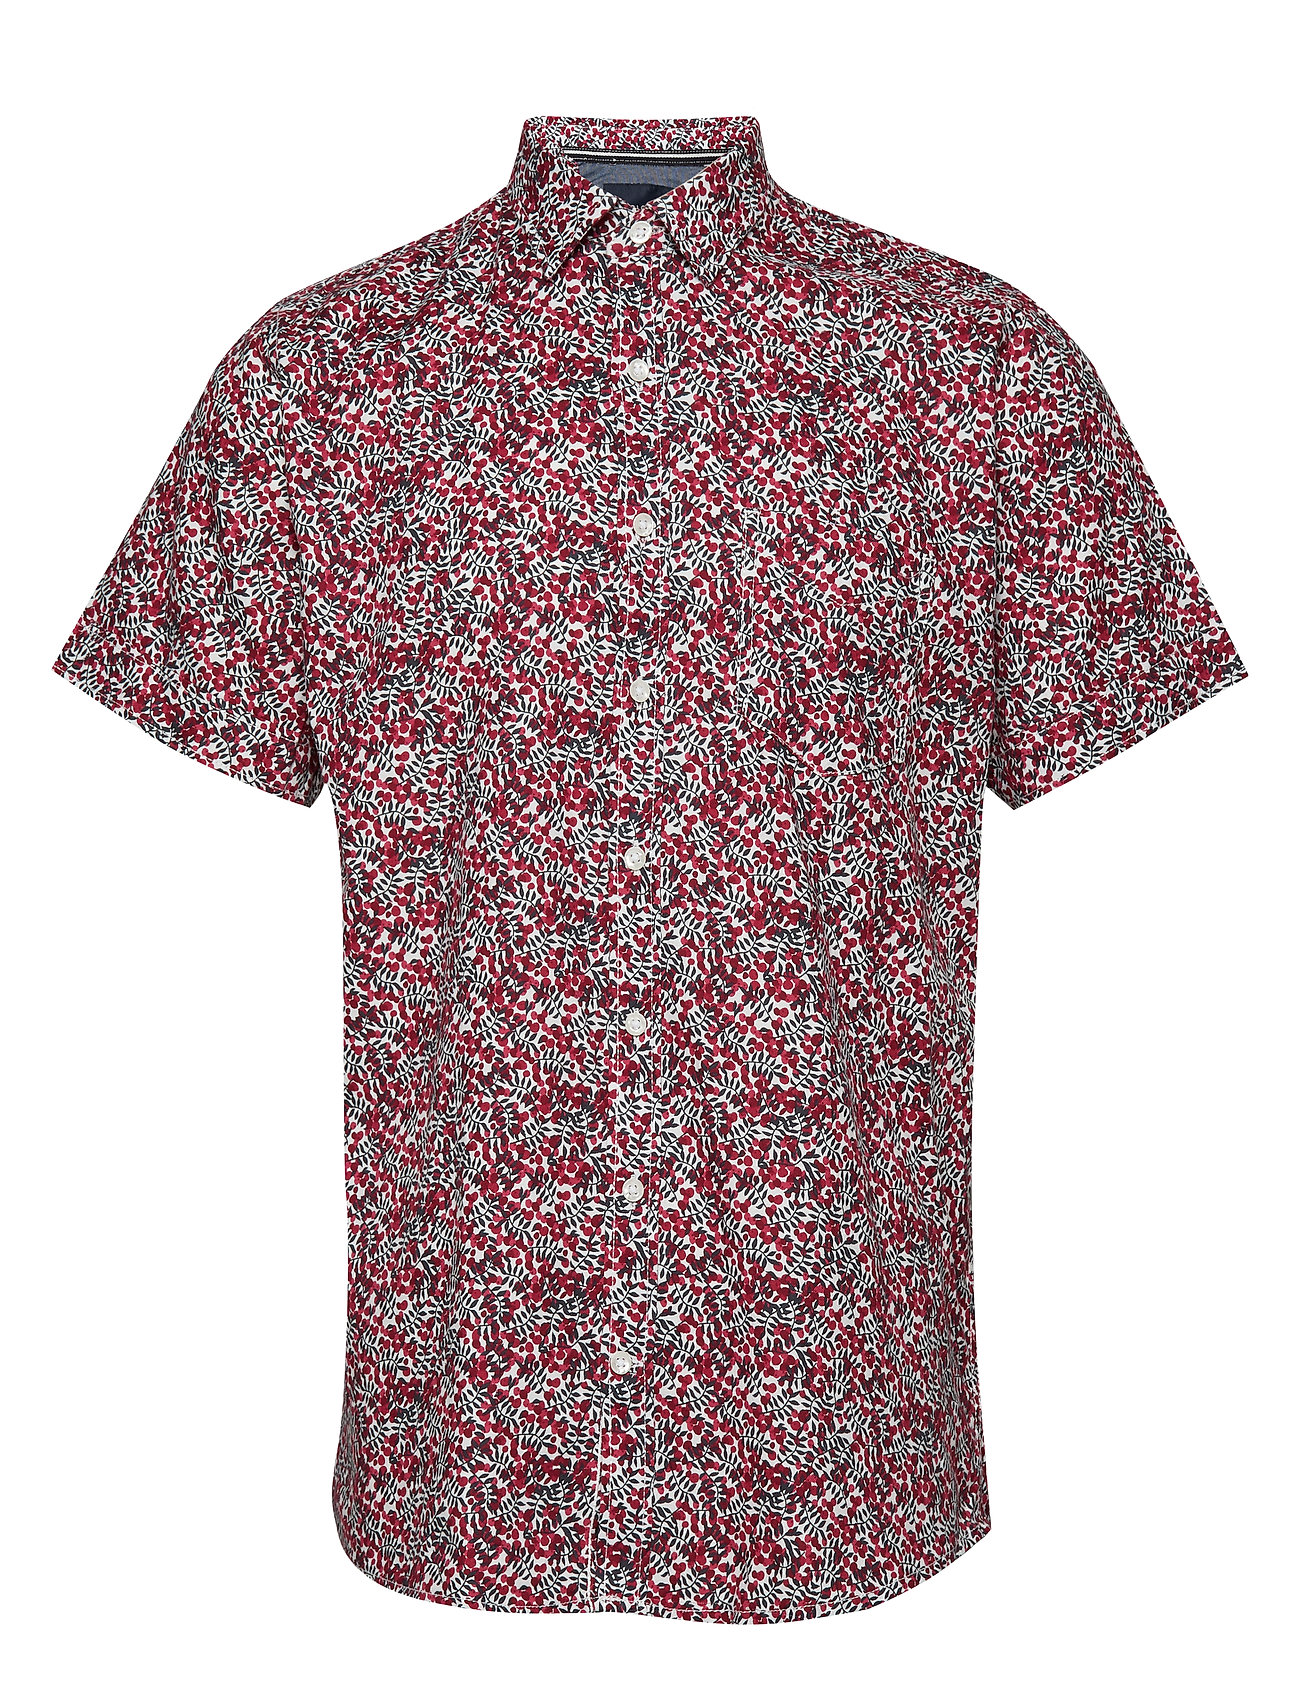 S s Shirtsred s SailSignal Shirtsred S ywvN8nOm0